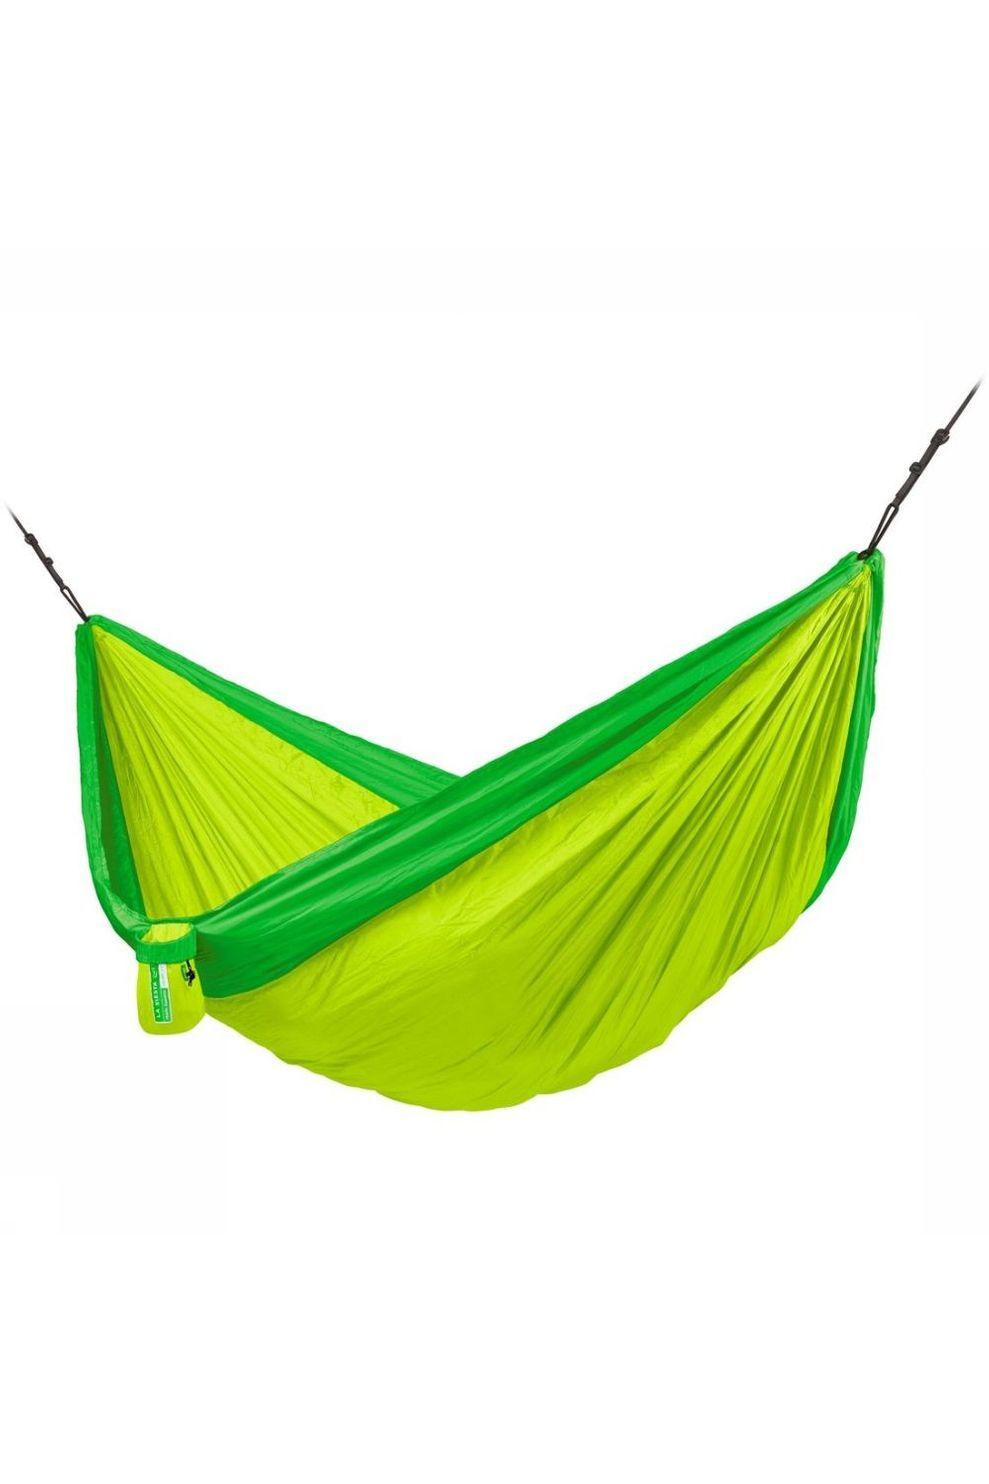 La Siesta Hangmat Colibri 3.0 Double - Limoen Groen